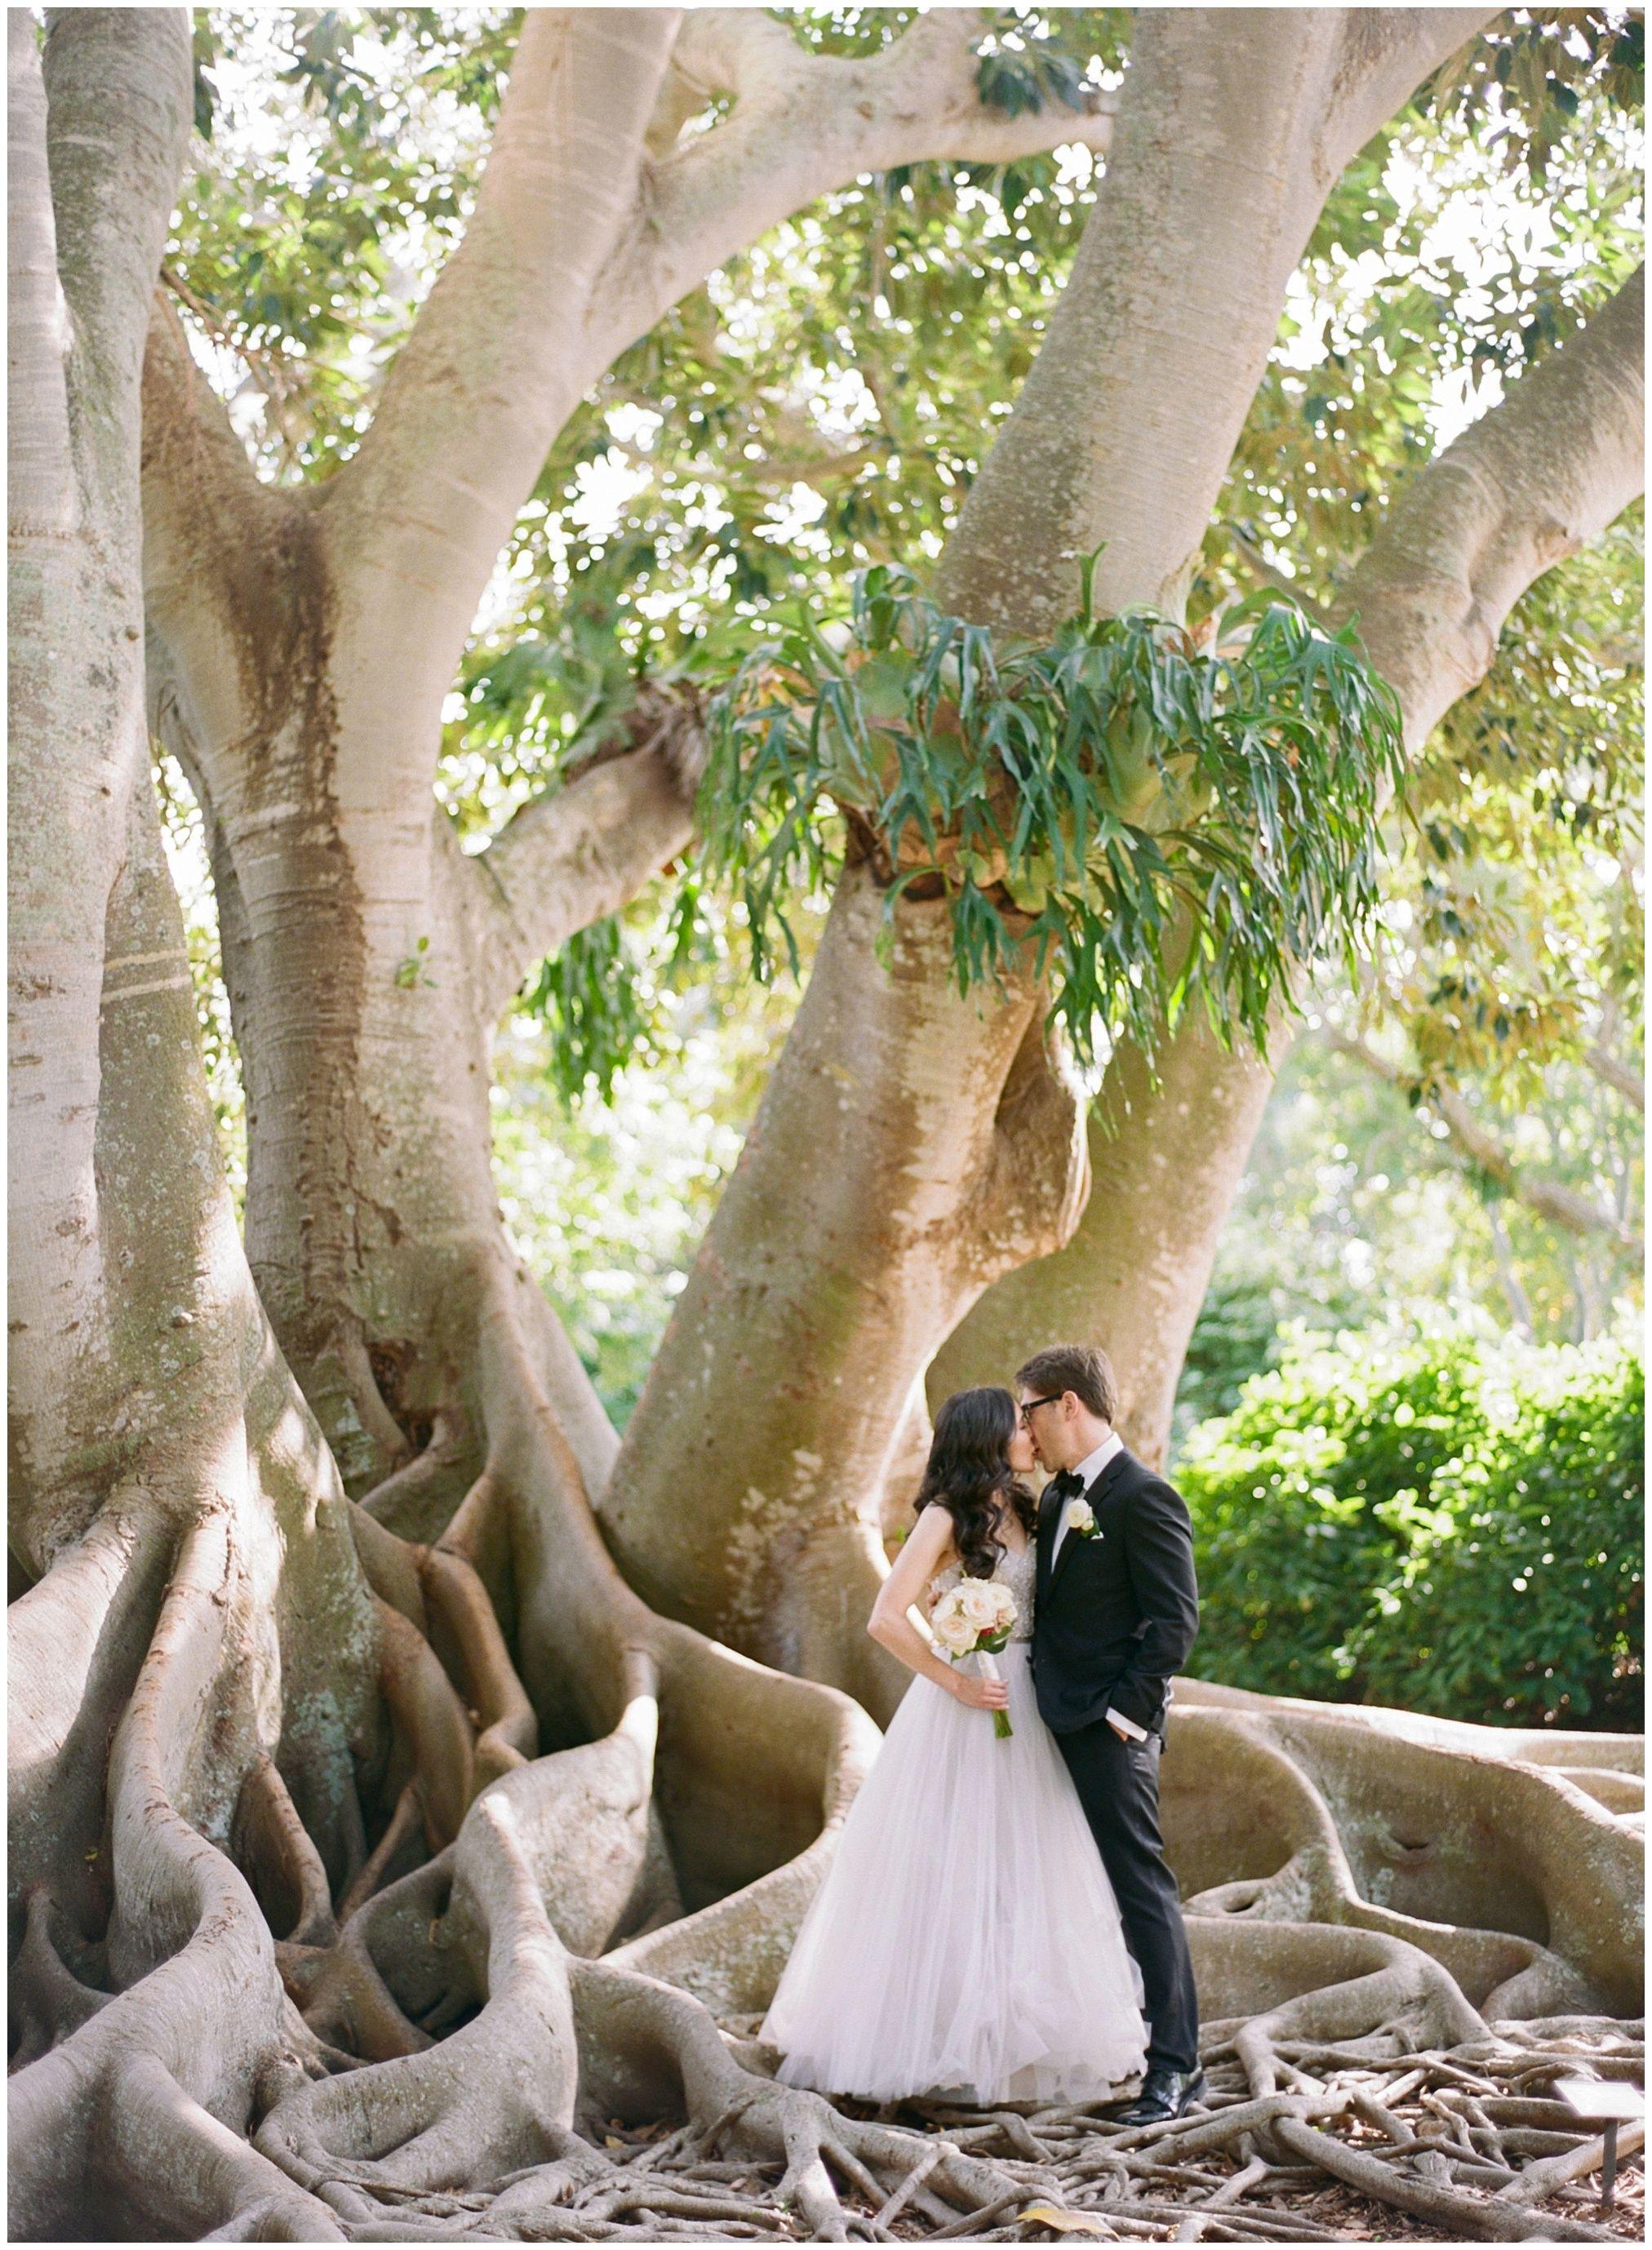 Marie Selby Botanical Gardens Wedding Botanical Gardens Wedding Wedding Photography Inspiration Wedding